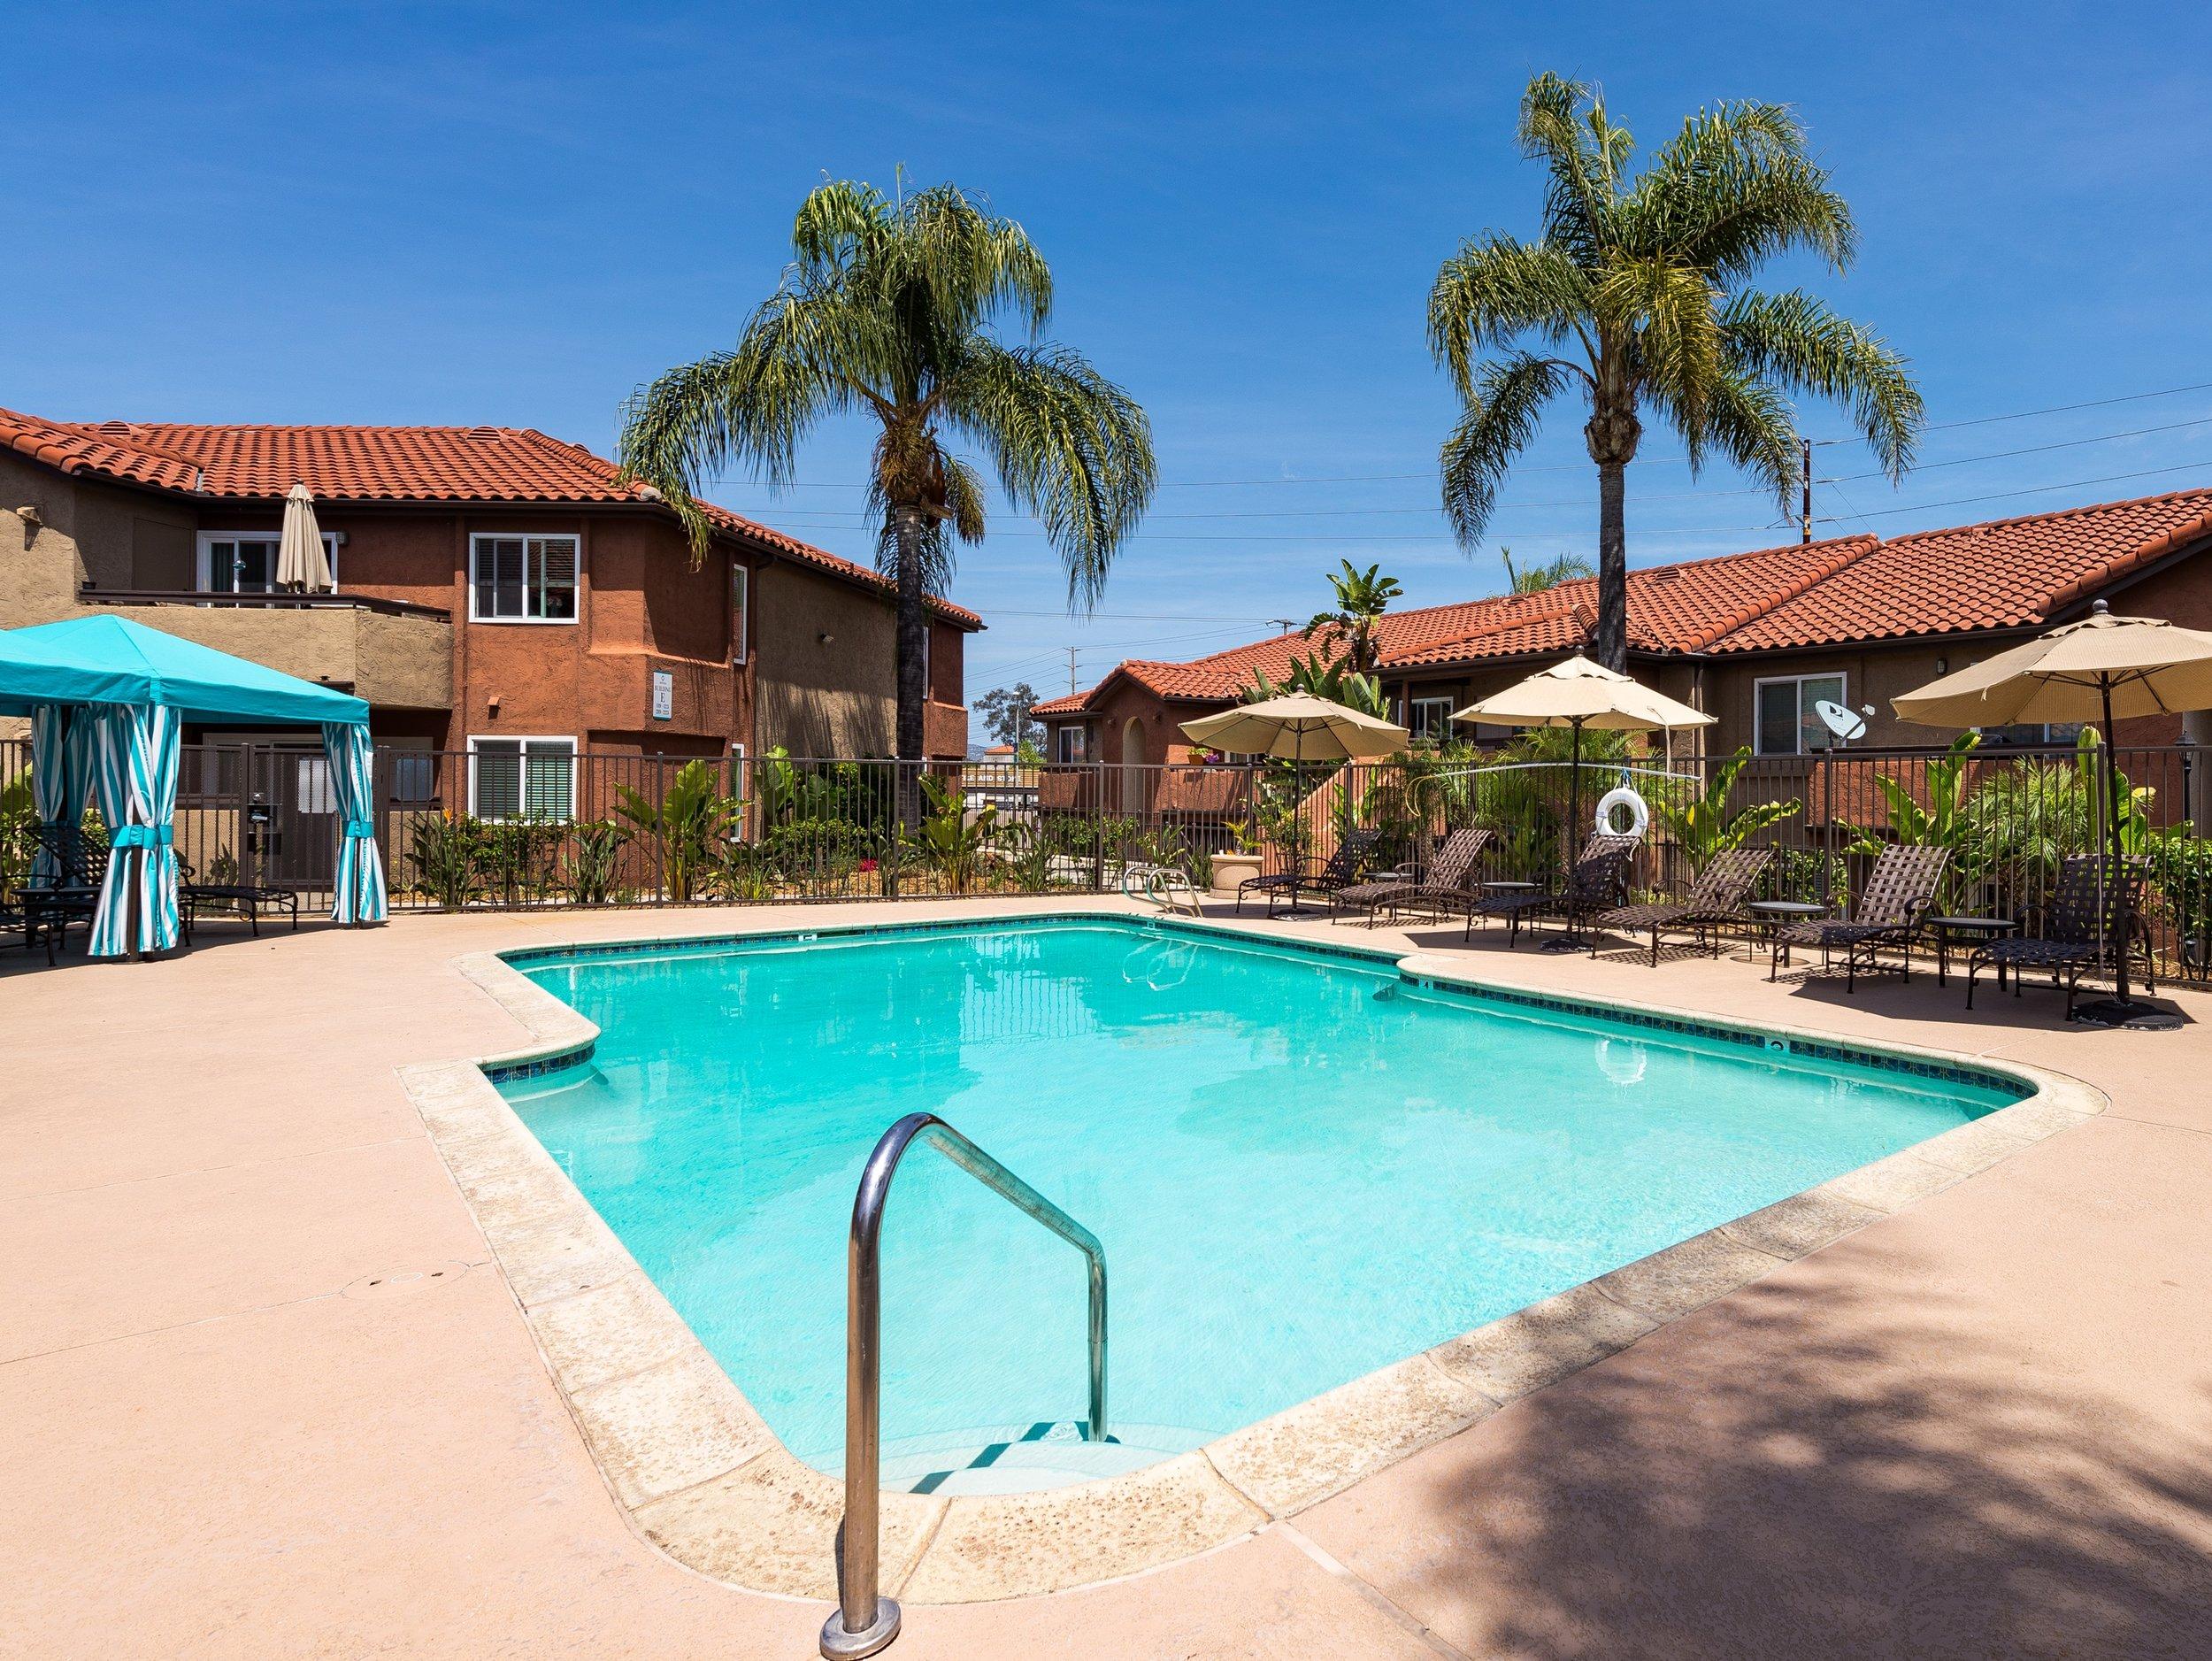 Artesia-Pool View 1.jpg